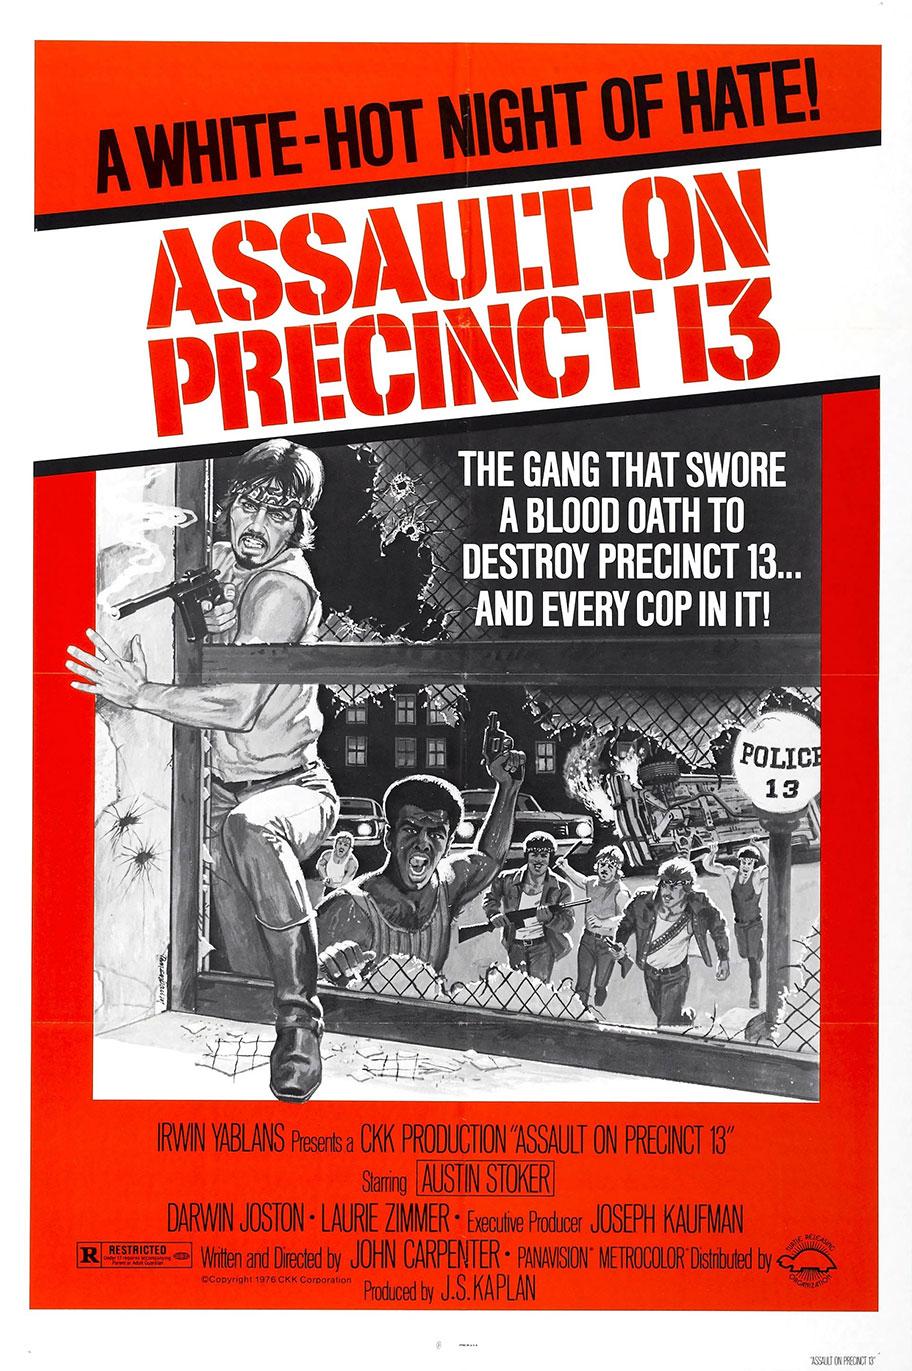 john-carpenter-assault-on-precinct-13-poster.jpg